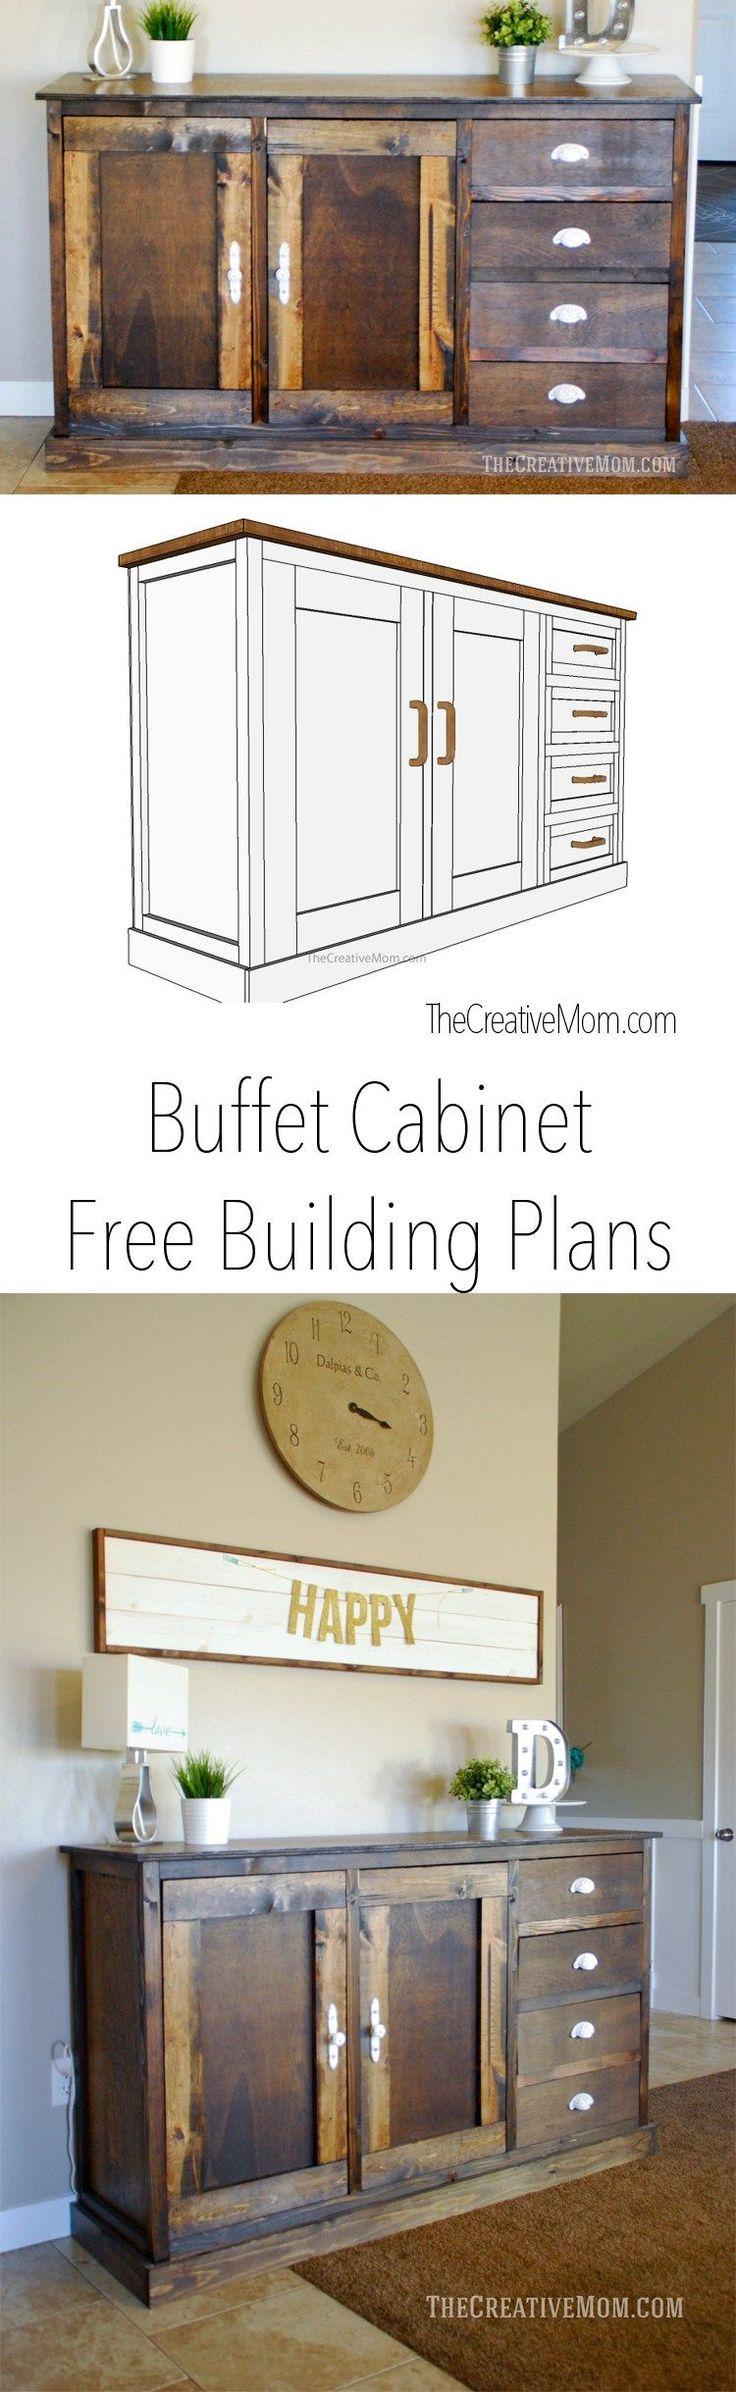 DIY Buffet Cabinet | Free Building Plans via The Creative Mom